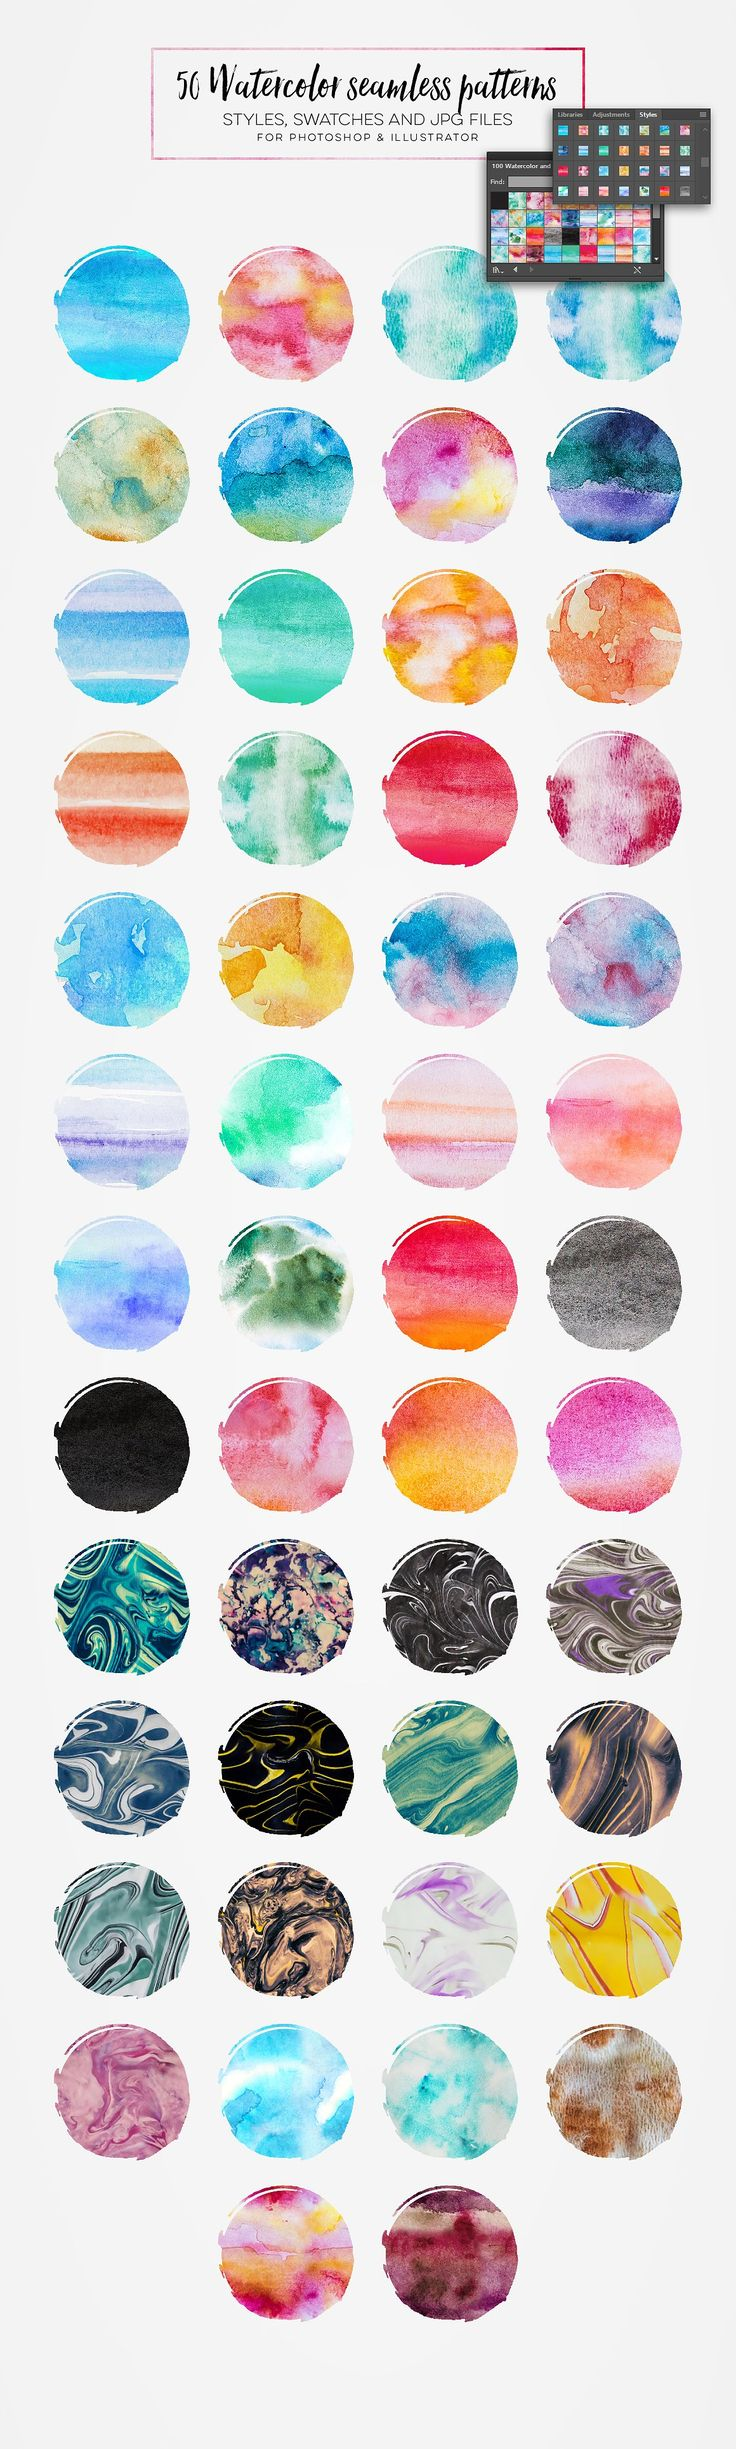 Artsy Watercolor Designer Toolkit by Zeppelin Graphics on @creativemarket